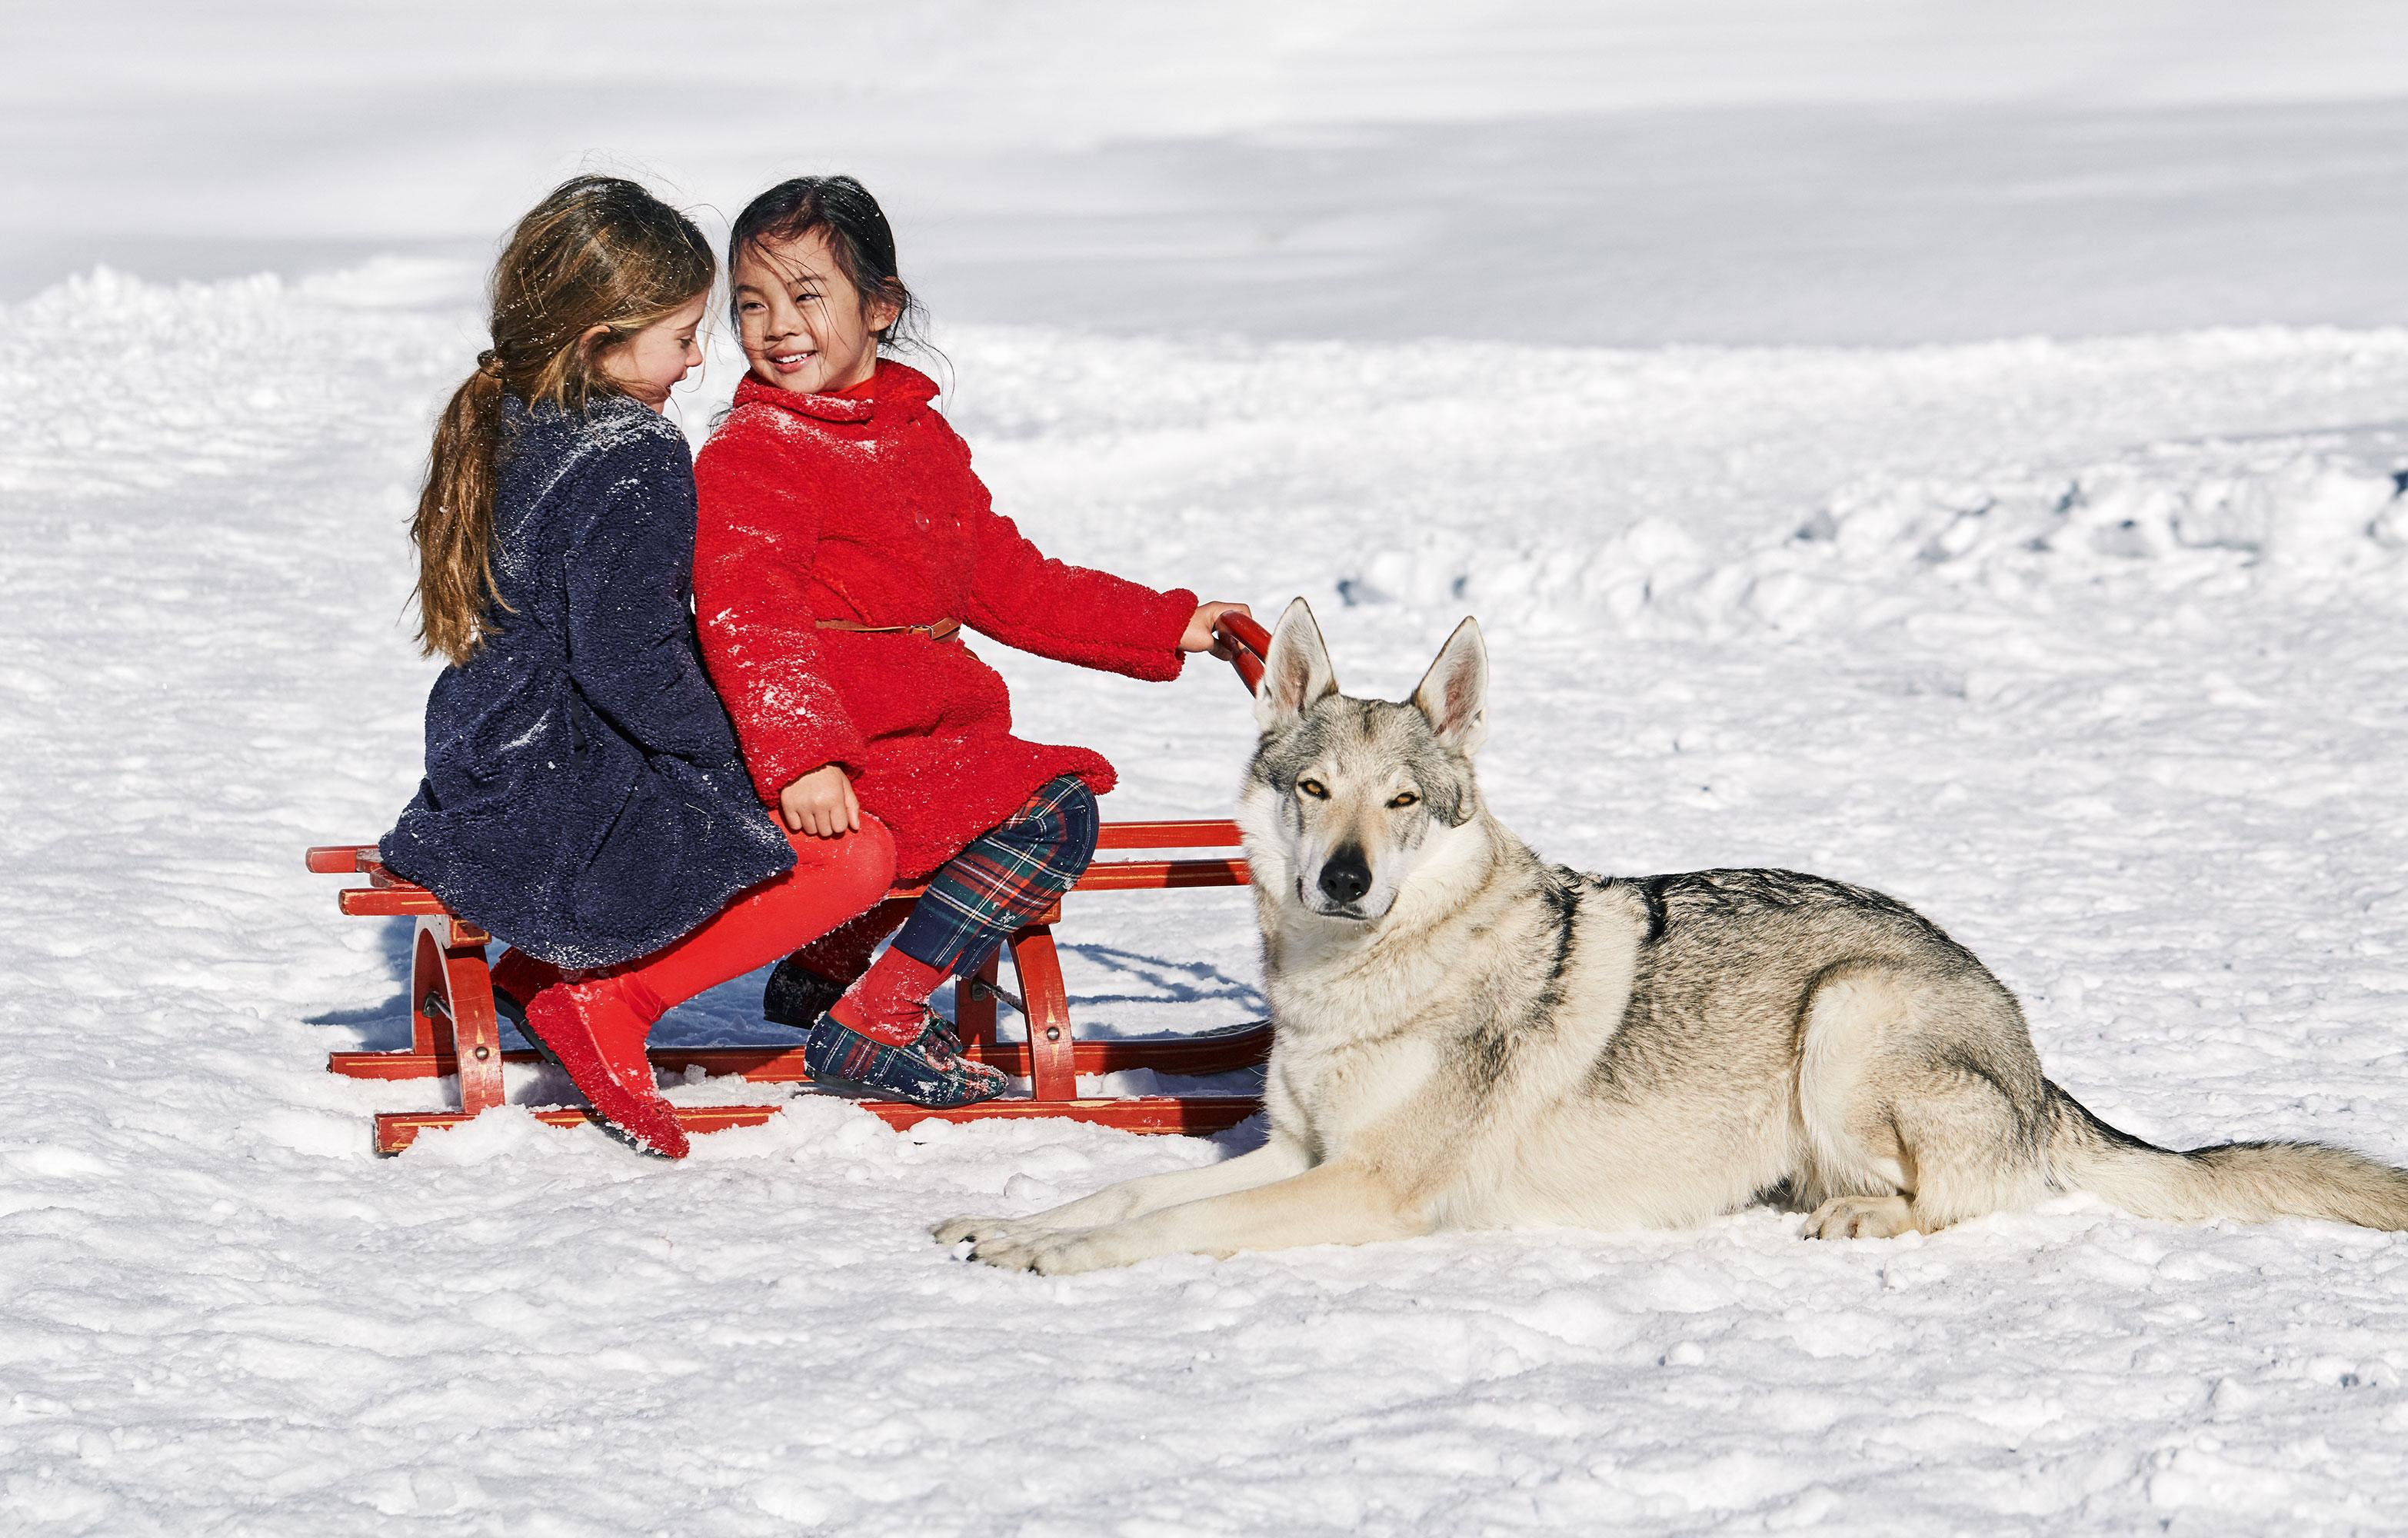 Il Gufo Arctic Wonderland FW 2018 | Serge Guerand | Il Gufo | Gioia | Sarah Grittini | Numerique Retouch Photo Retouching Studio